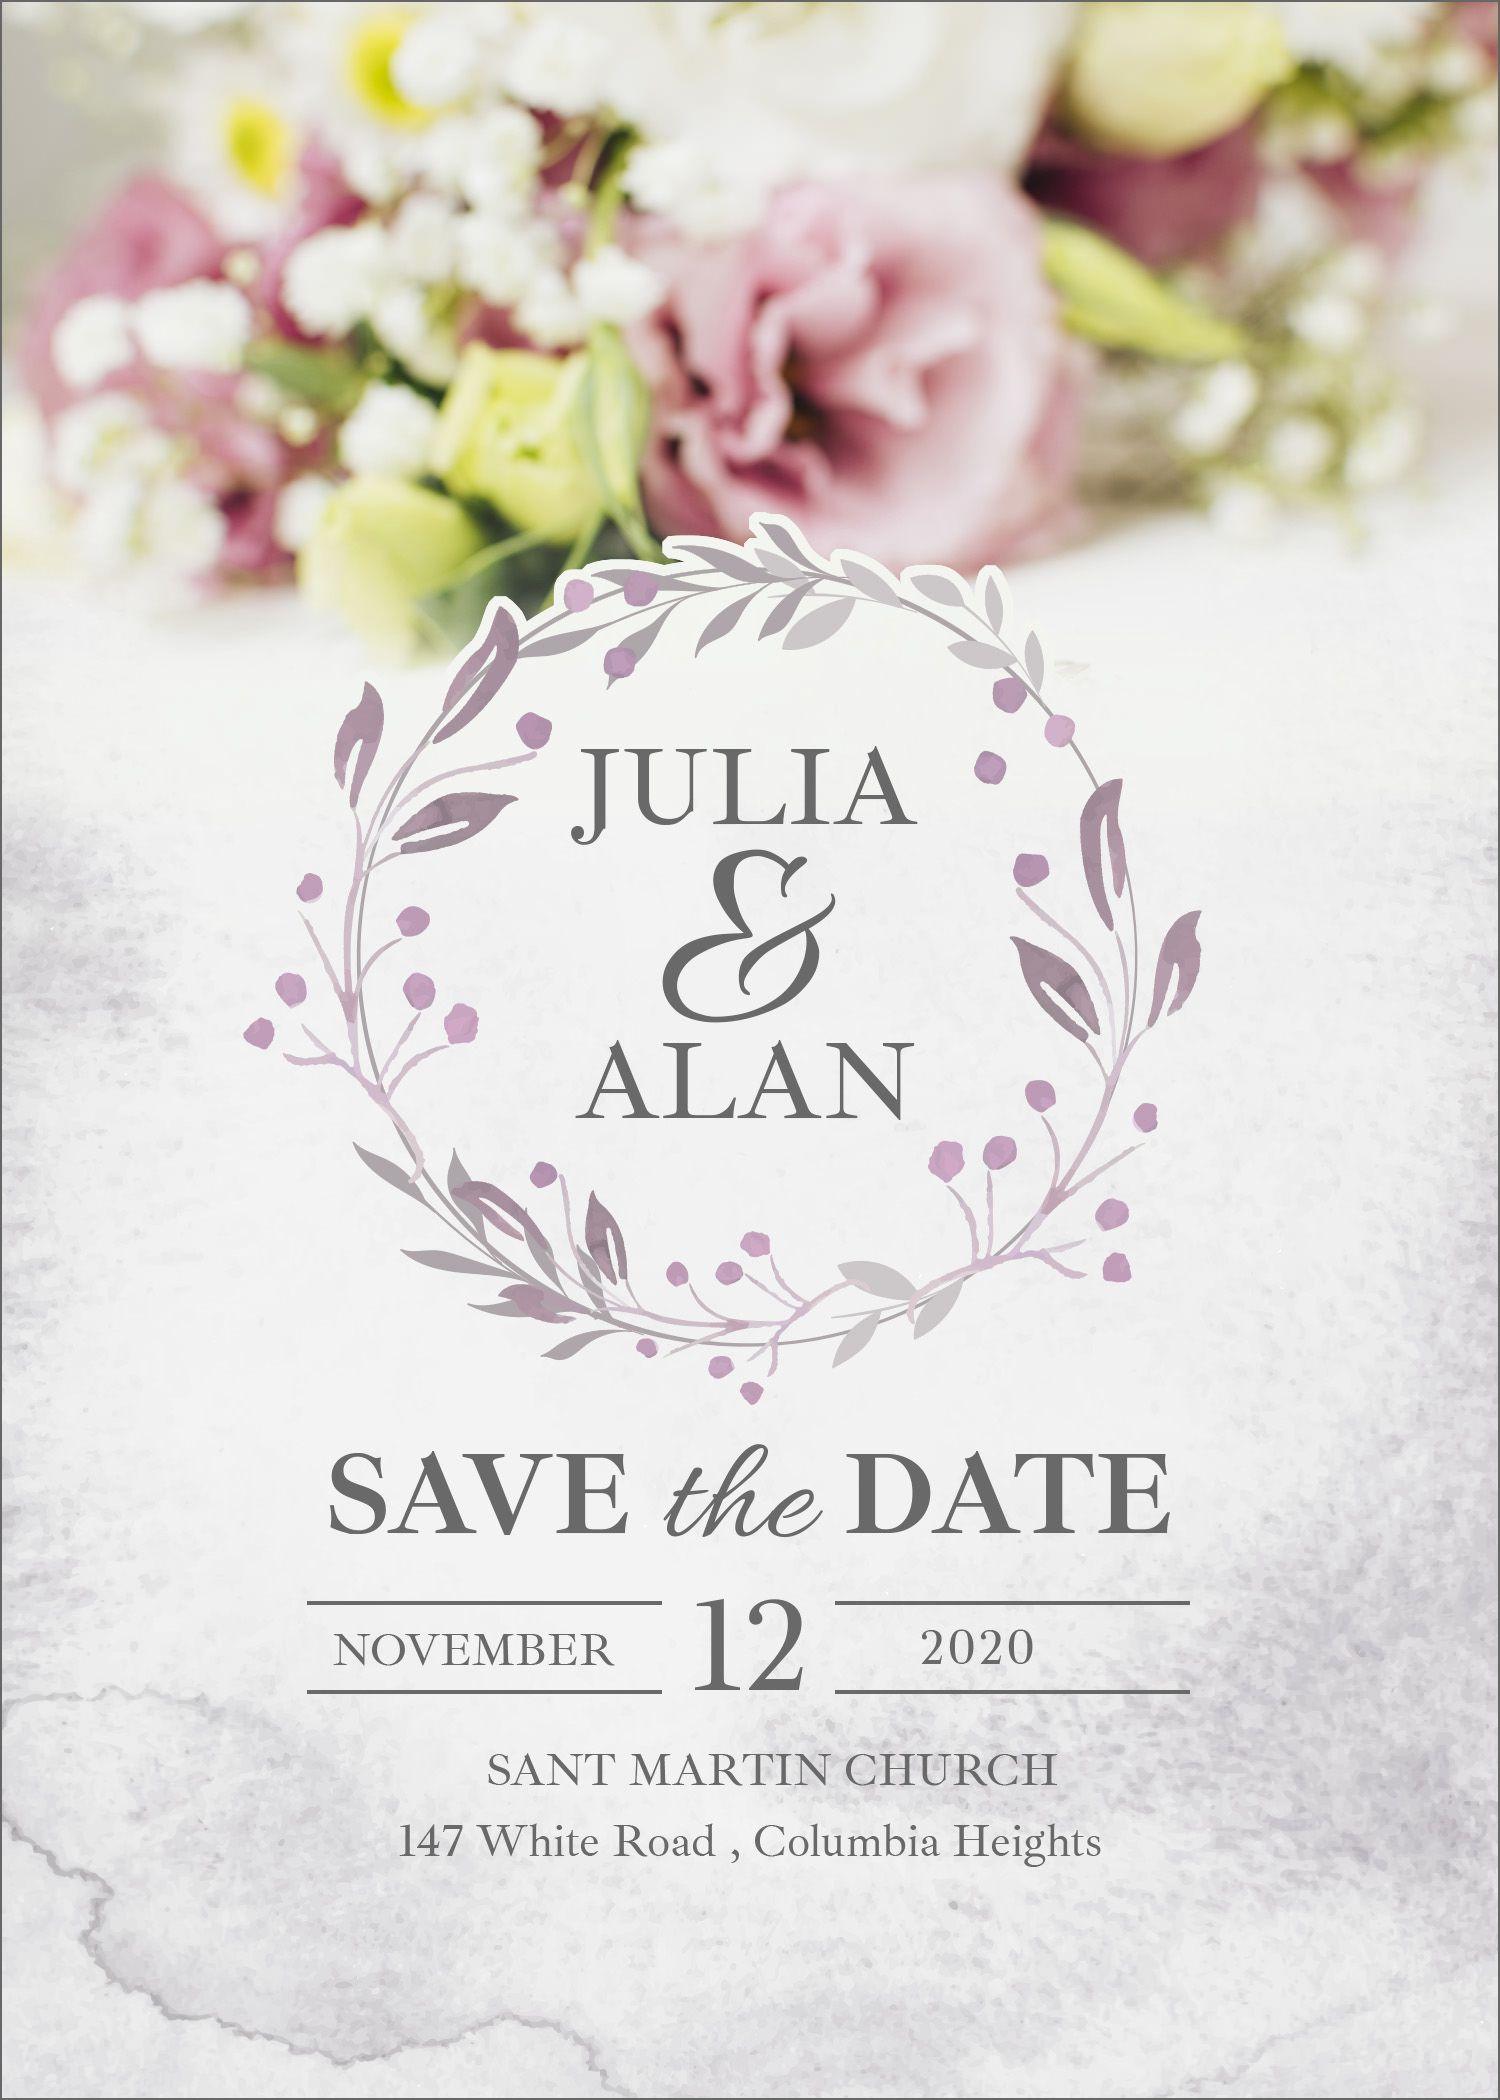 008 Awful Sample Wedding Invitation Template Image  Templates Wording CardFull